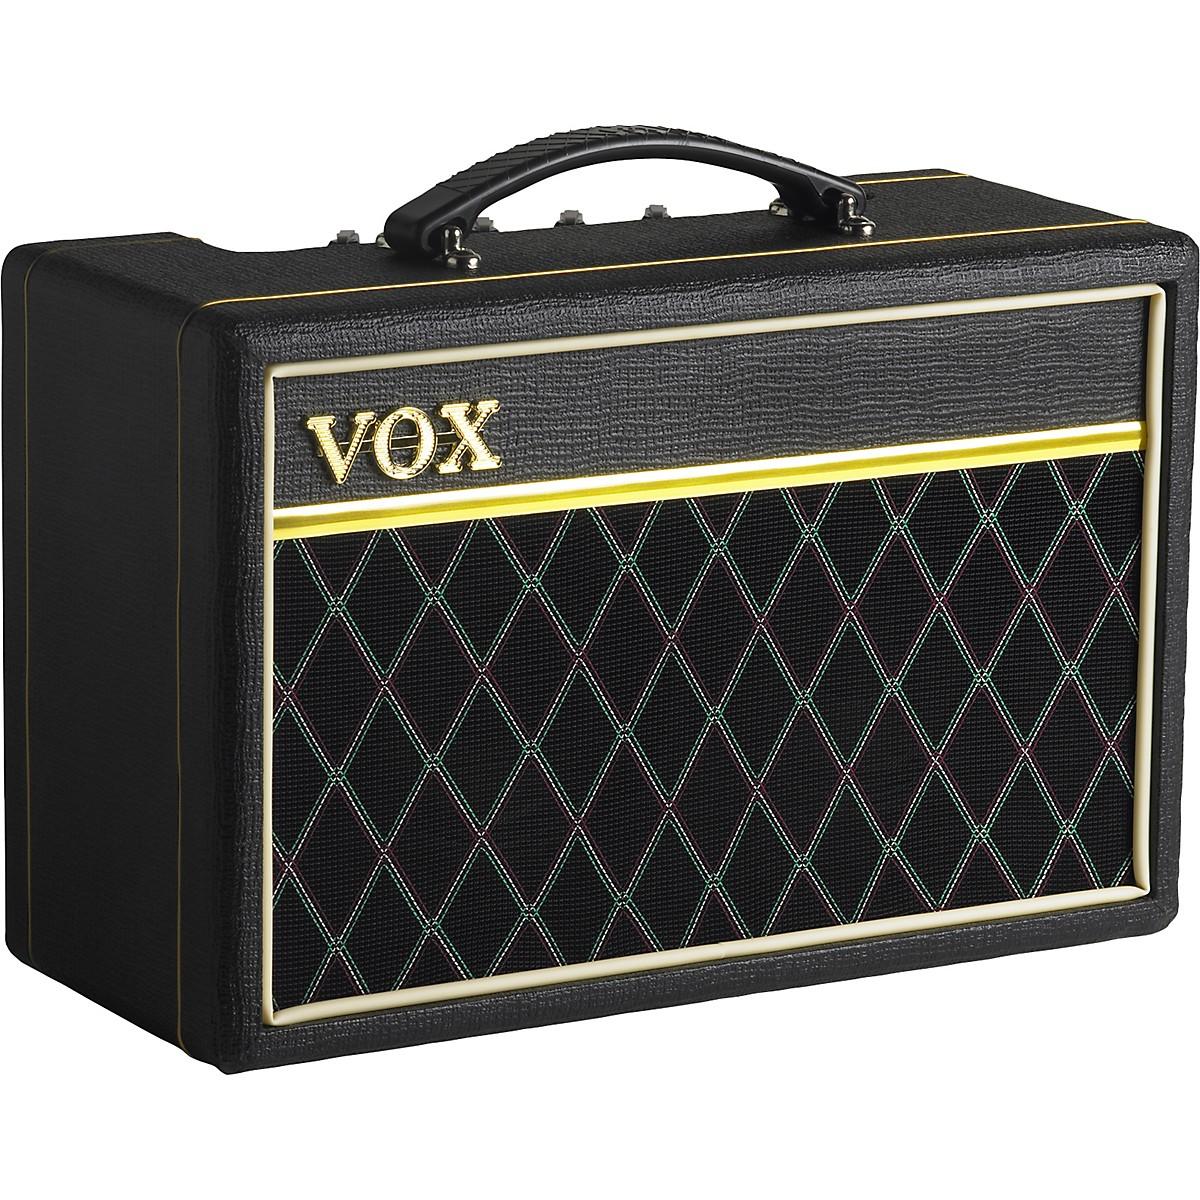 Vox Pathfinder 10w Bass Combo Amp Black Guitar Center